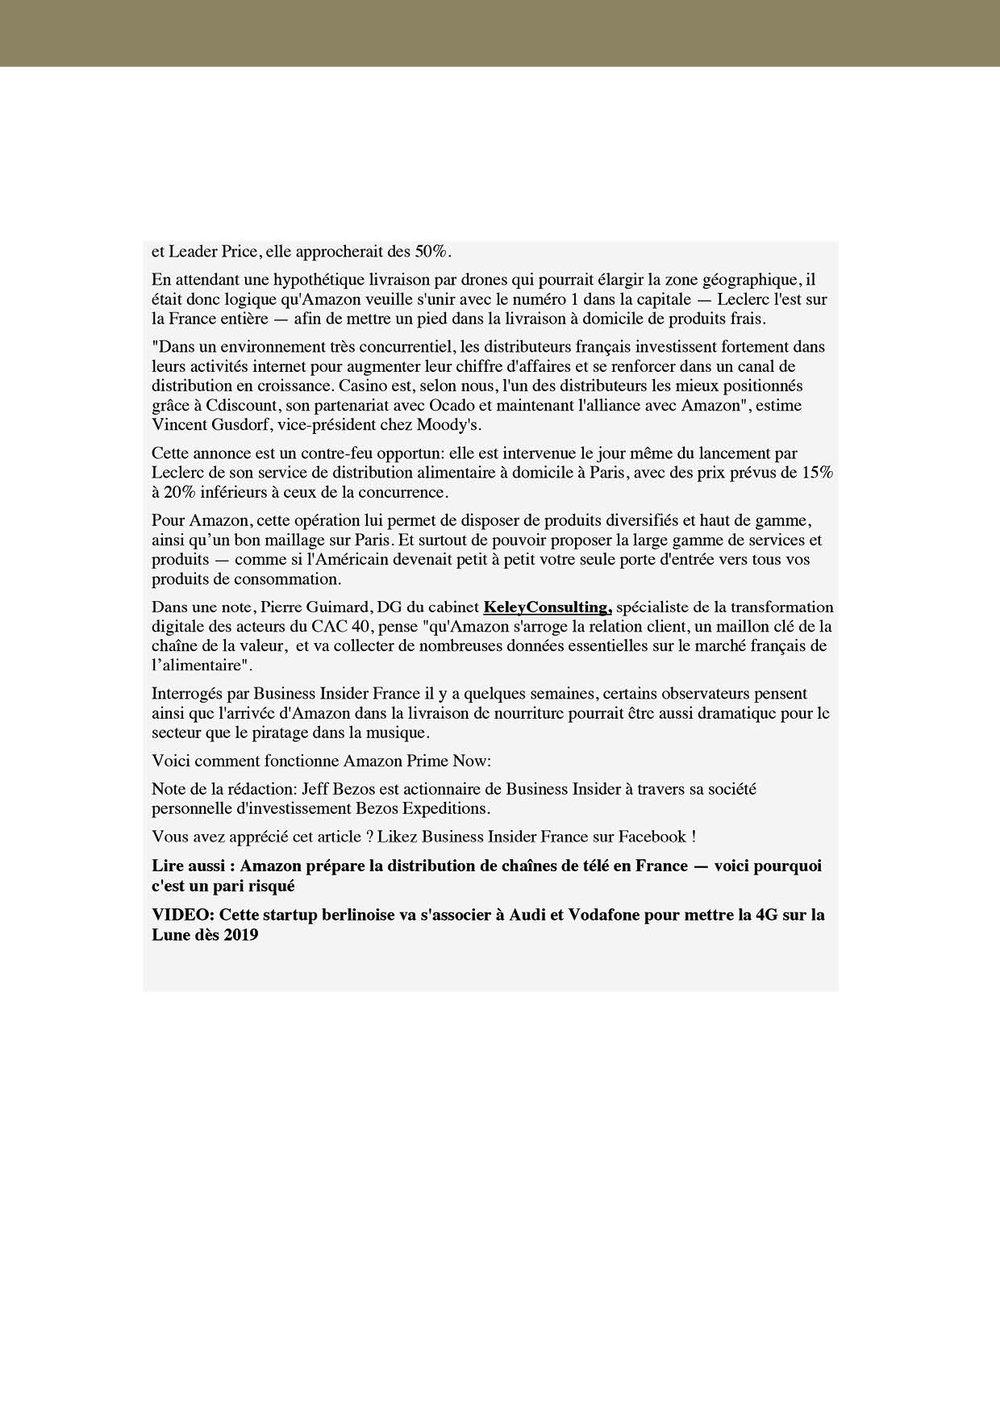 BOOKMEDIA_MAR48.jpg